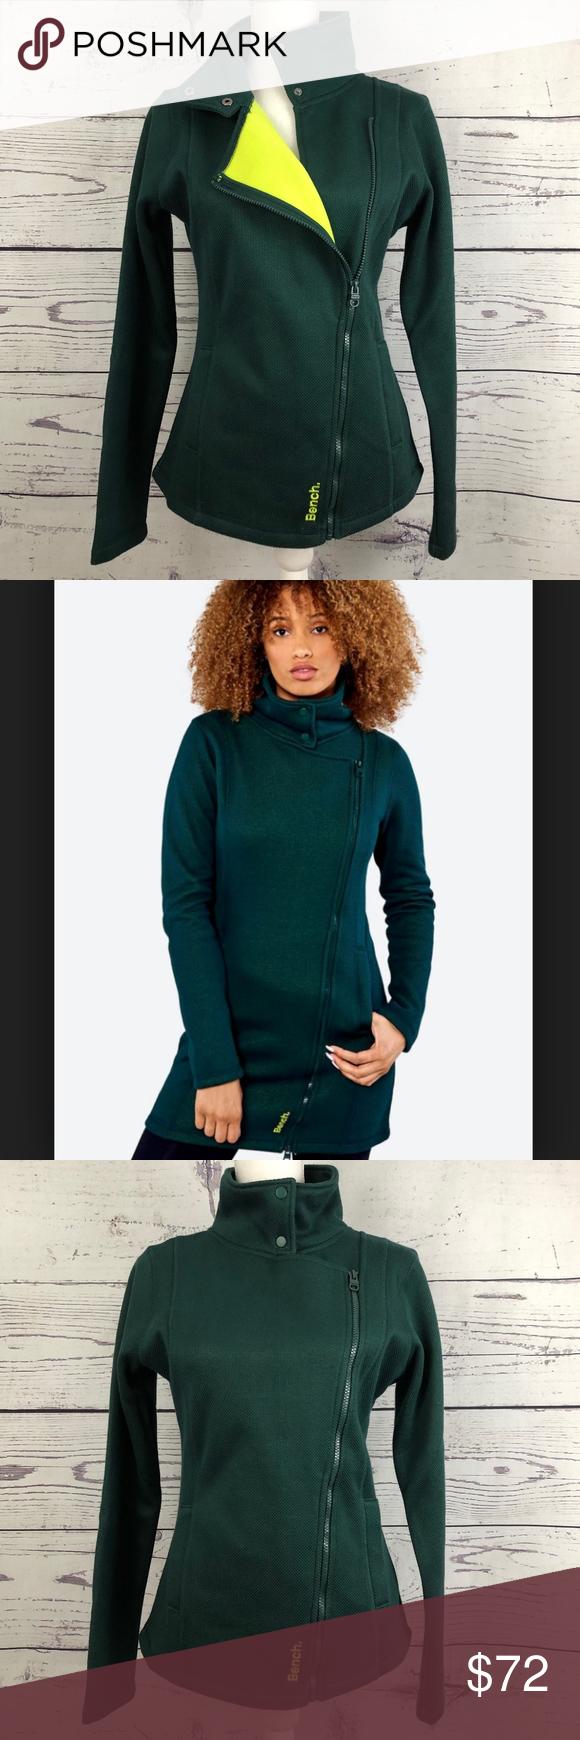 Bench Tally Asymmetrical Zip Funnel Long Jacket Women S Xs M Approximate Measurements 15 16 Shoulder To Shoulder Bench Jackets Long Jackets Asymmetrical Zip [ 1740 x 580 Pixel ]